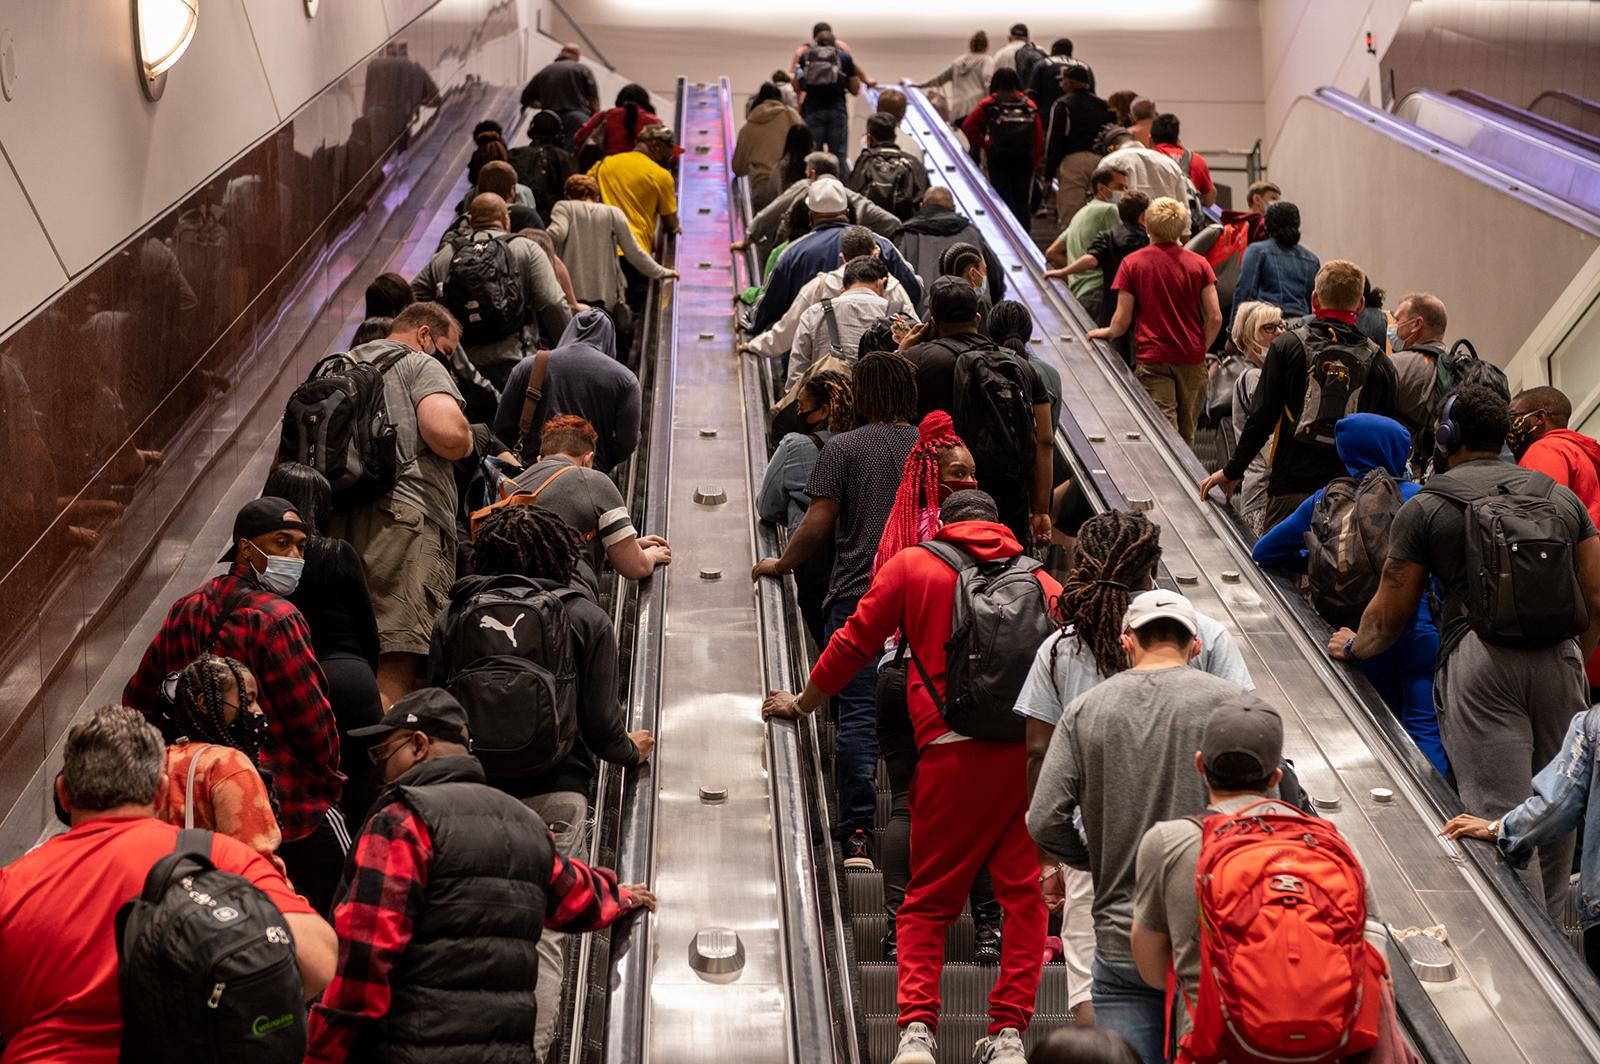 People ride up escalators on their way to baggage claim at Hartsfield-Jackson Atlanta International Airport in Atlanta, Georgia, on Friday, May 28.